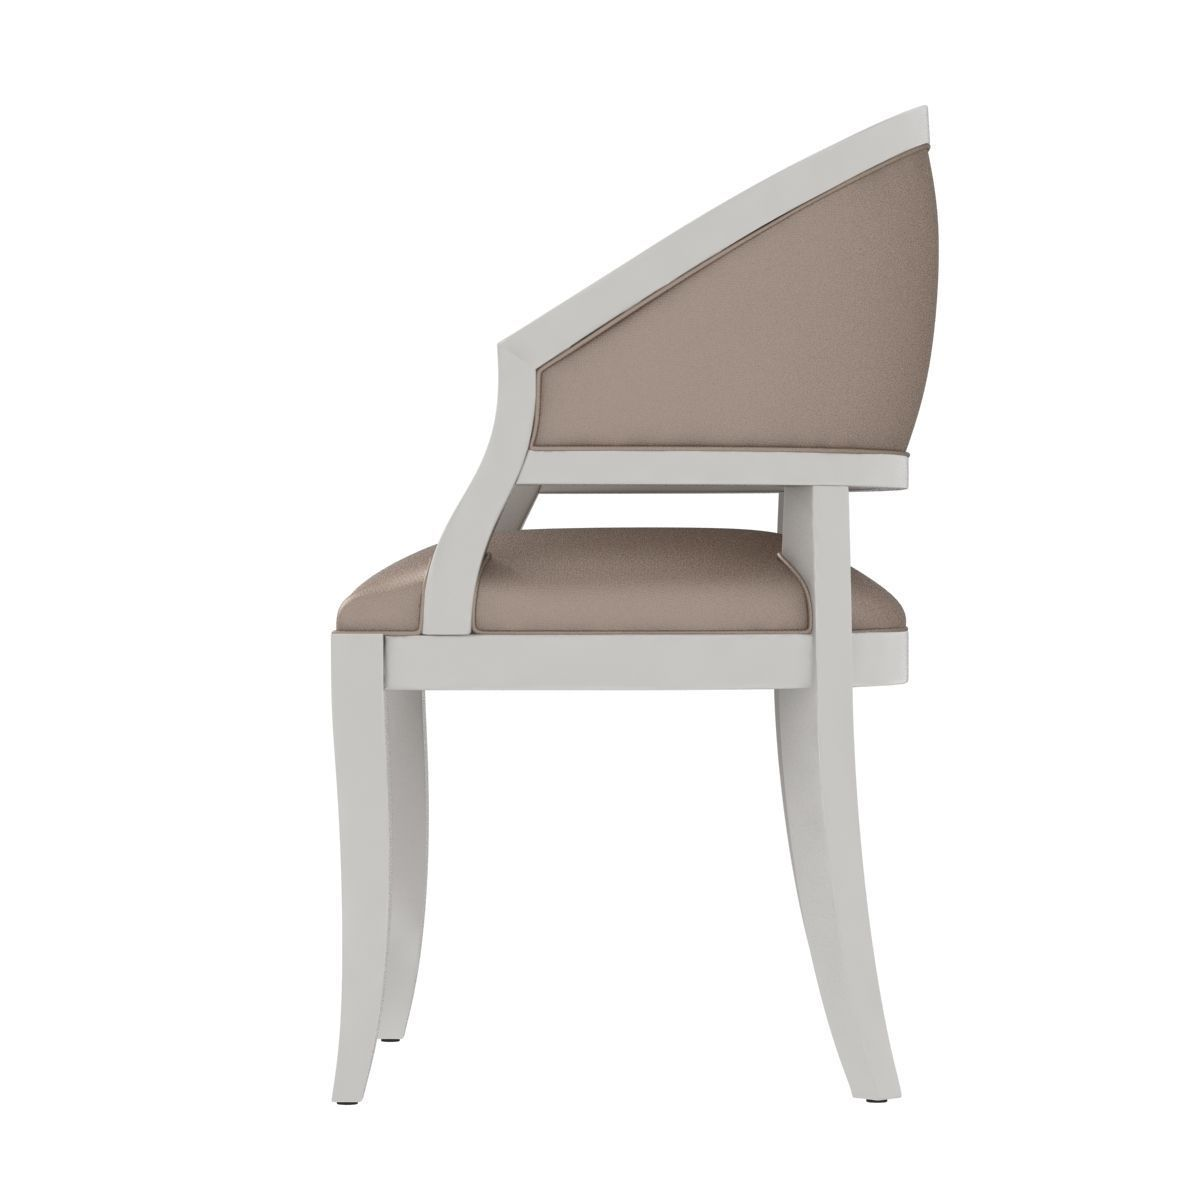 ... Made Goods Sylvie Dining Chair 3d Model Max Obj 3ds Fbx Mtl 2 ...